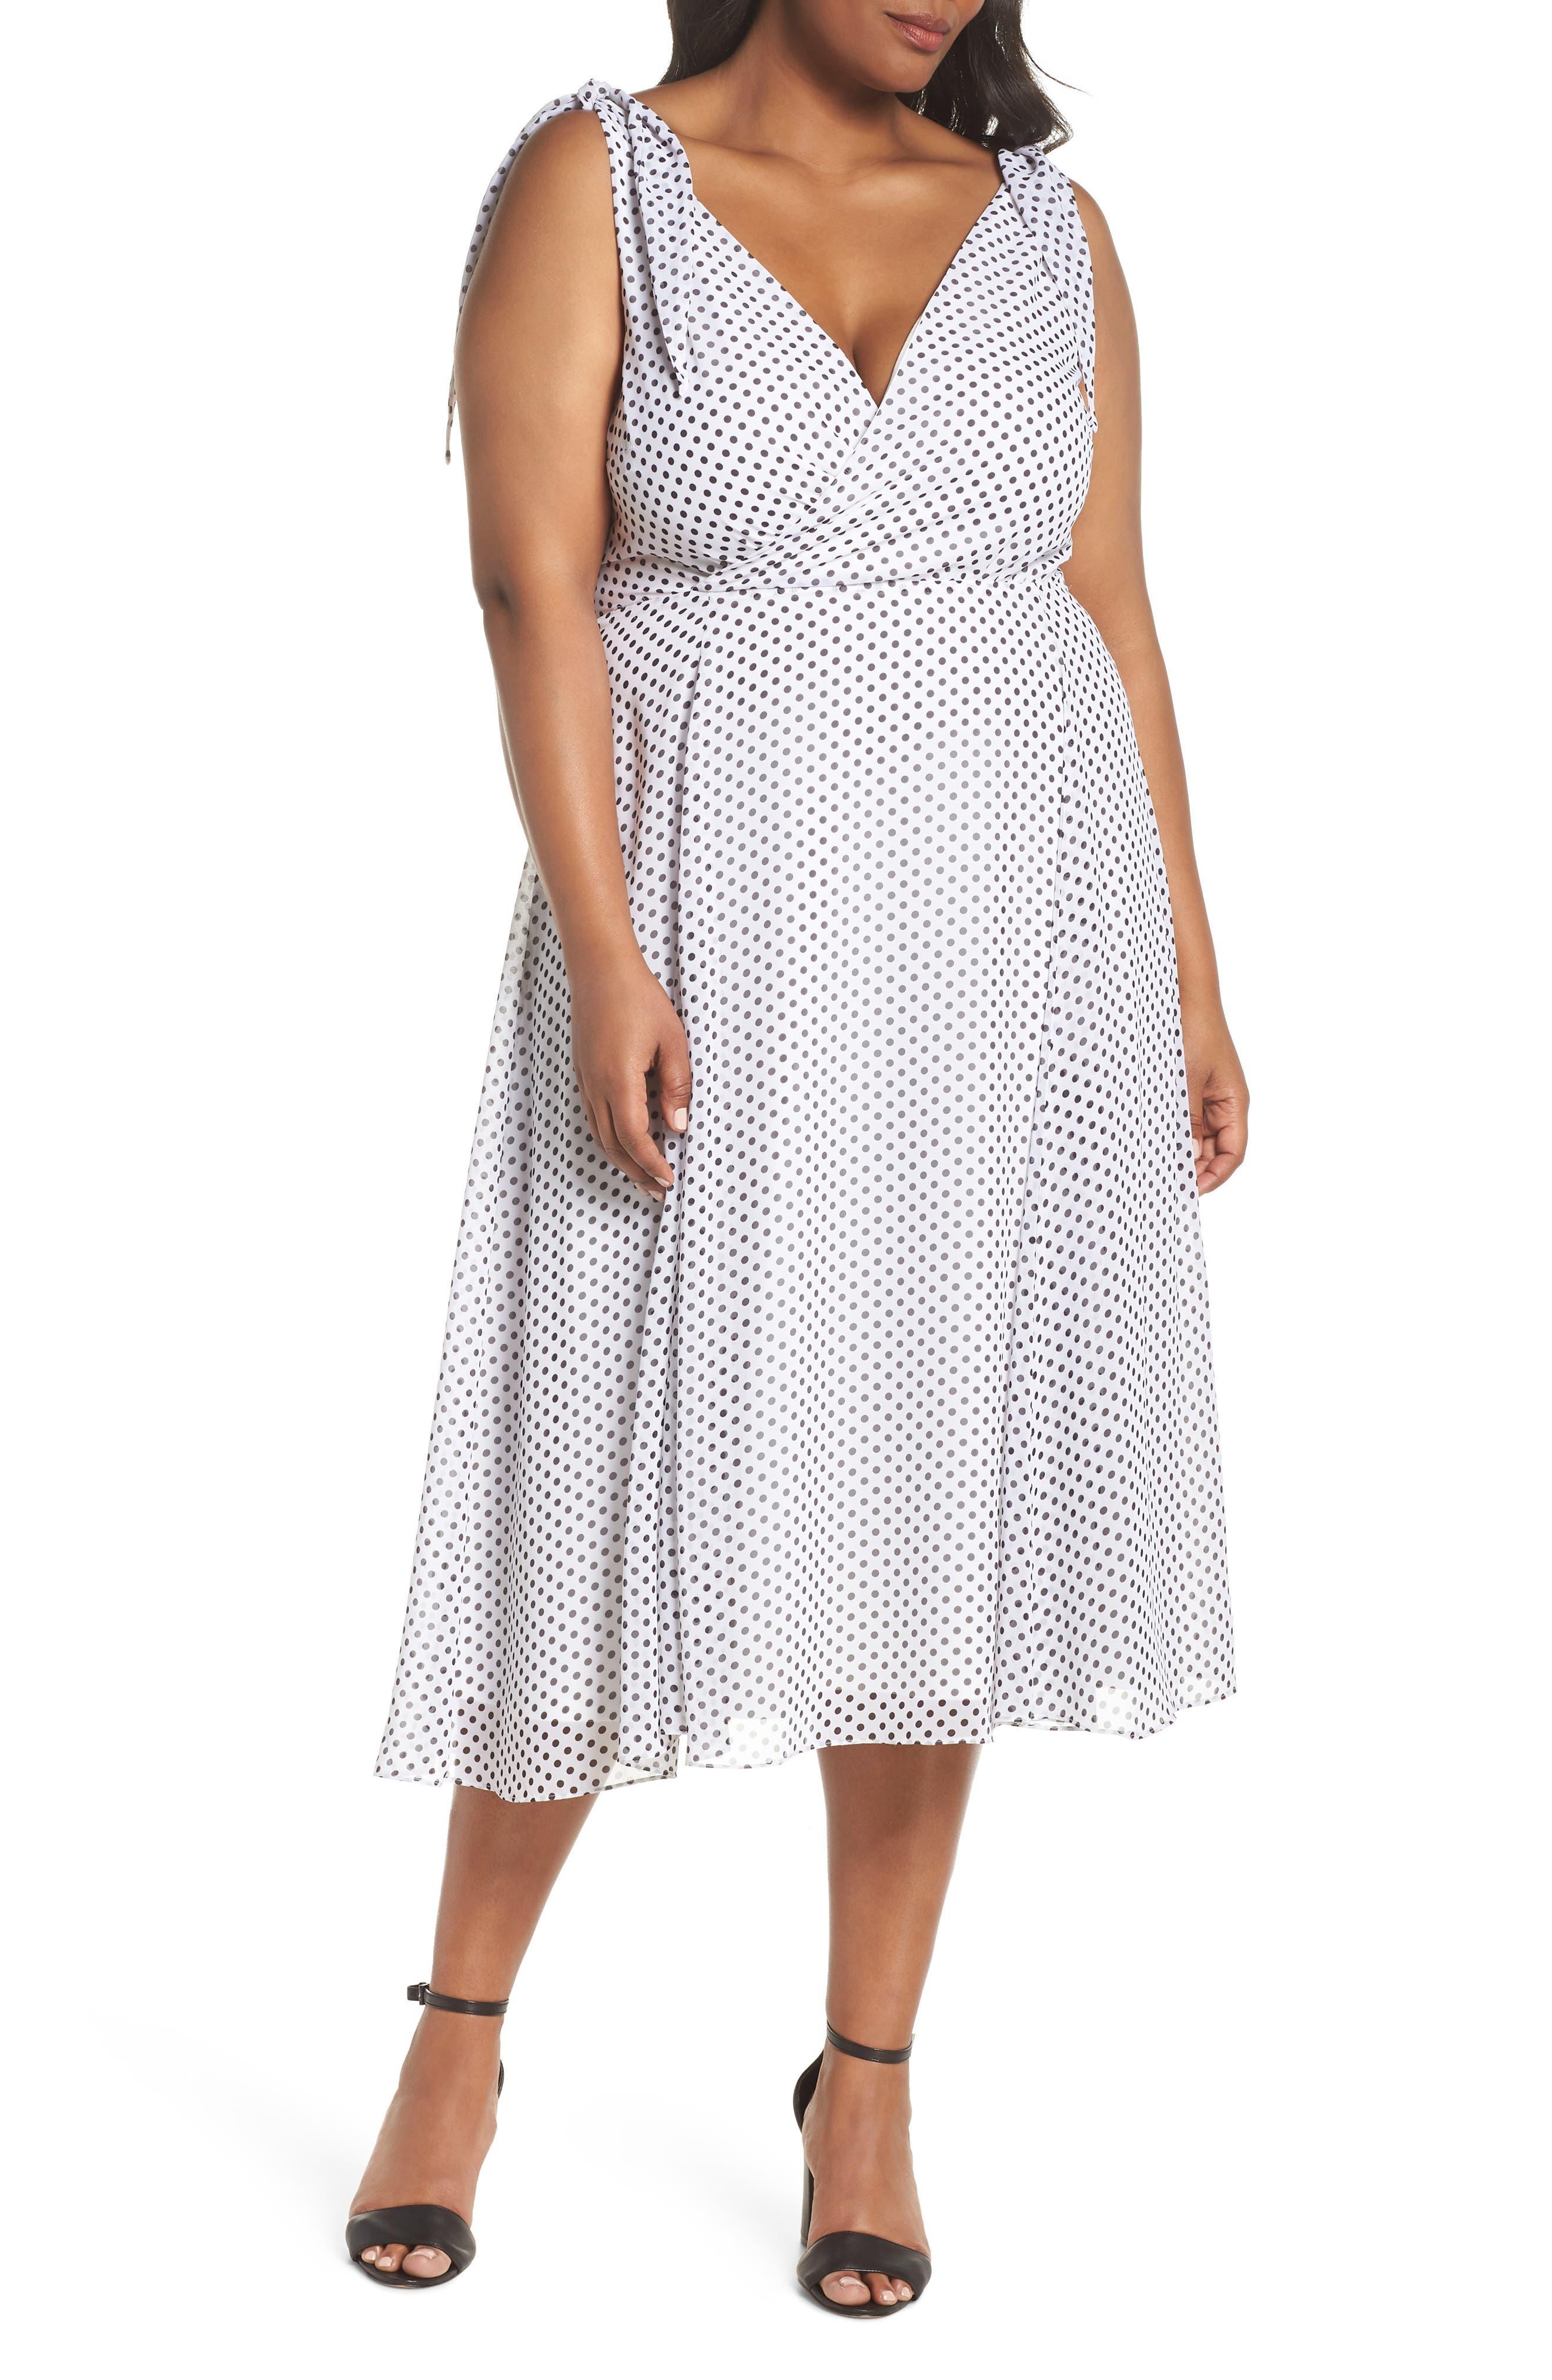 CITY CHIC, Alika Dot Fit & Flare Dress, Main thumbnail 1, color, IVORY